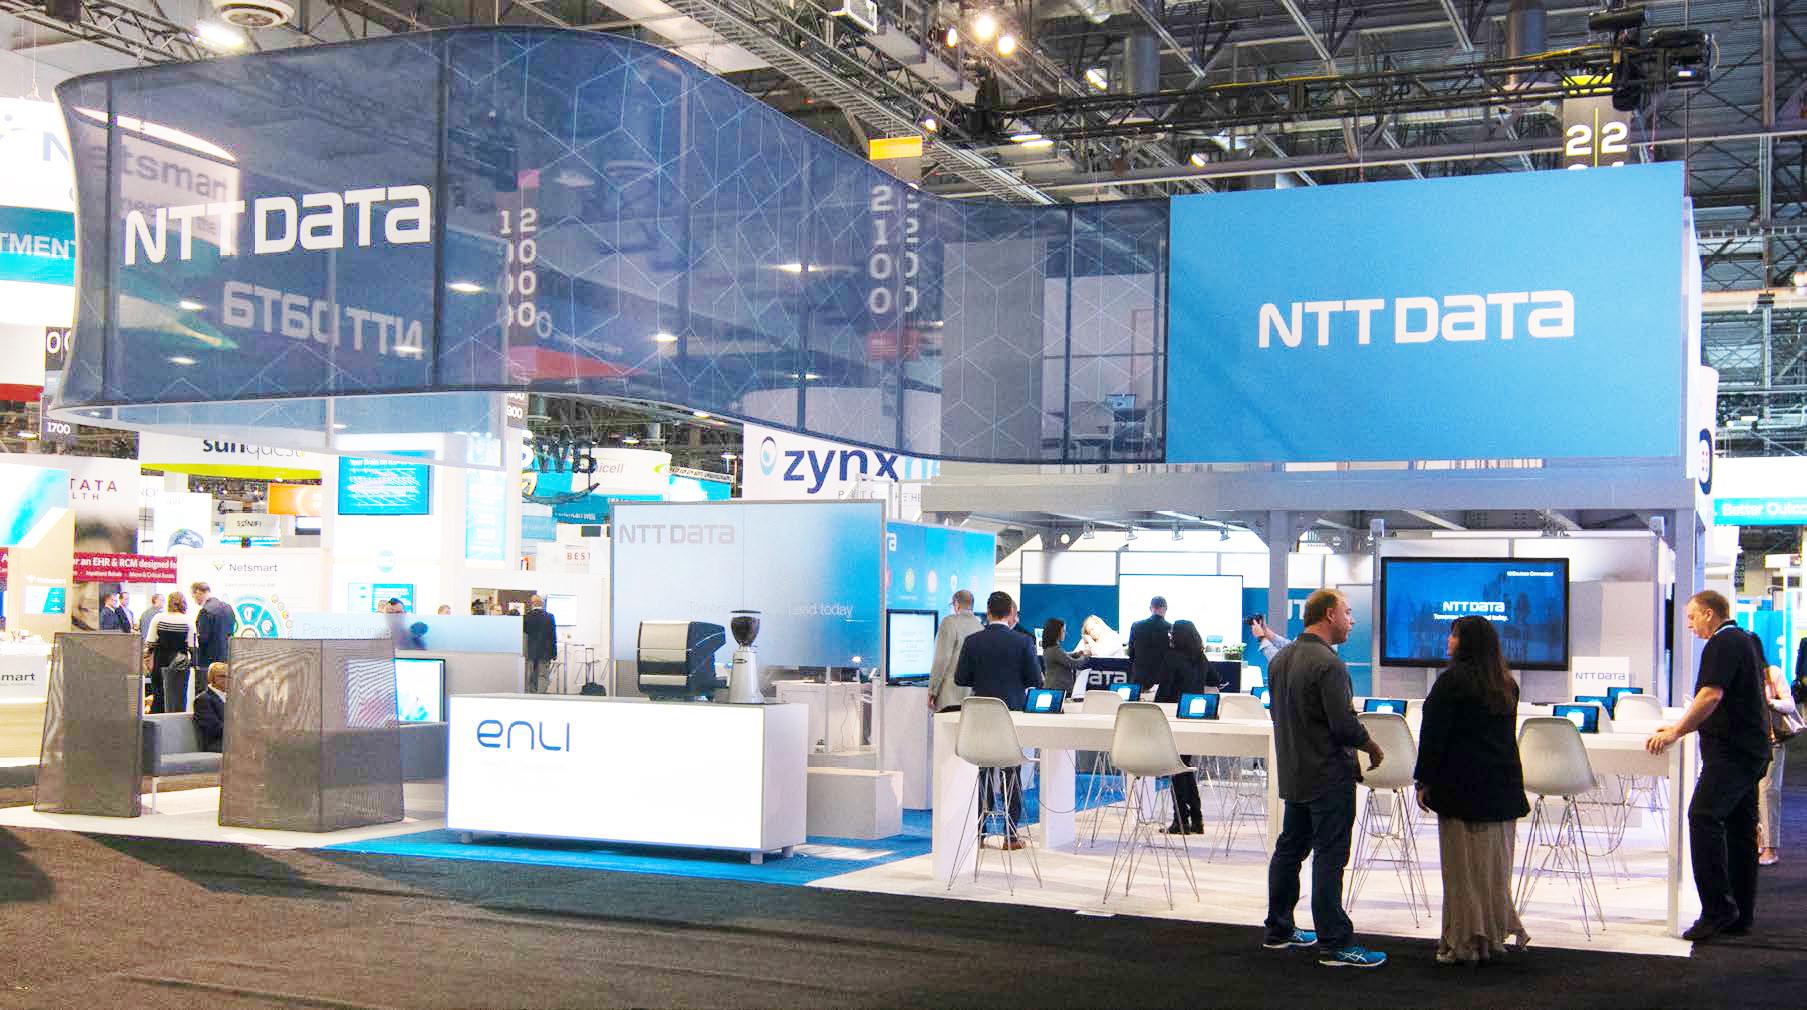 NTT_DATA_system_rules_r5_051518 9.jpg